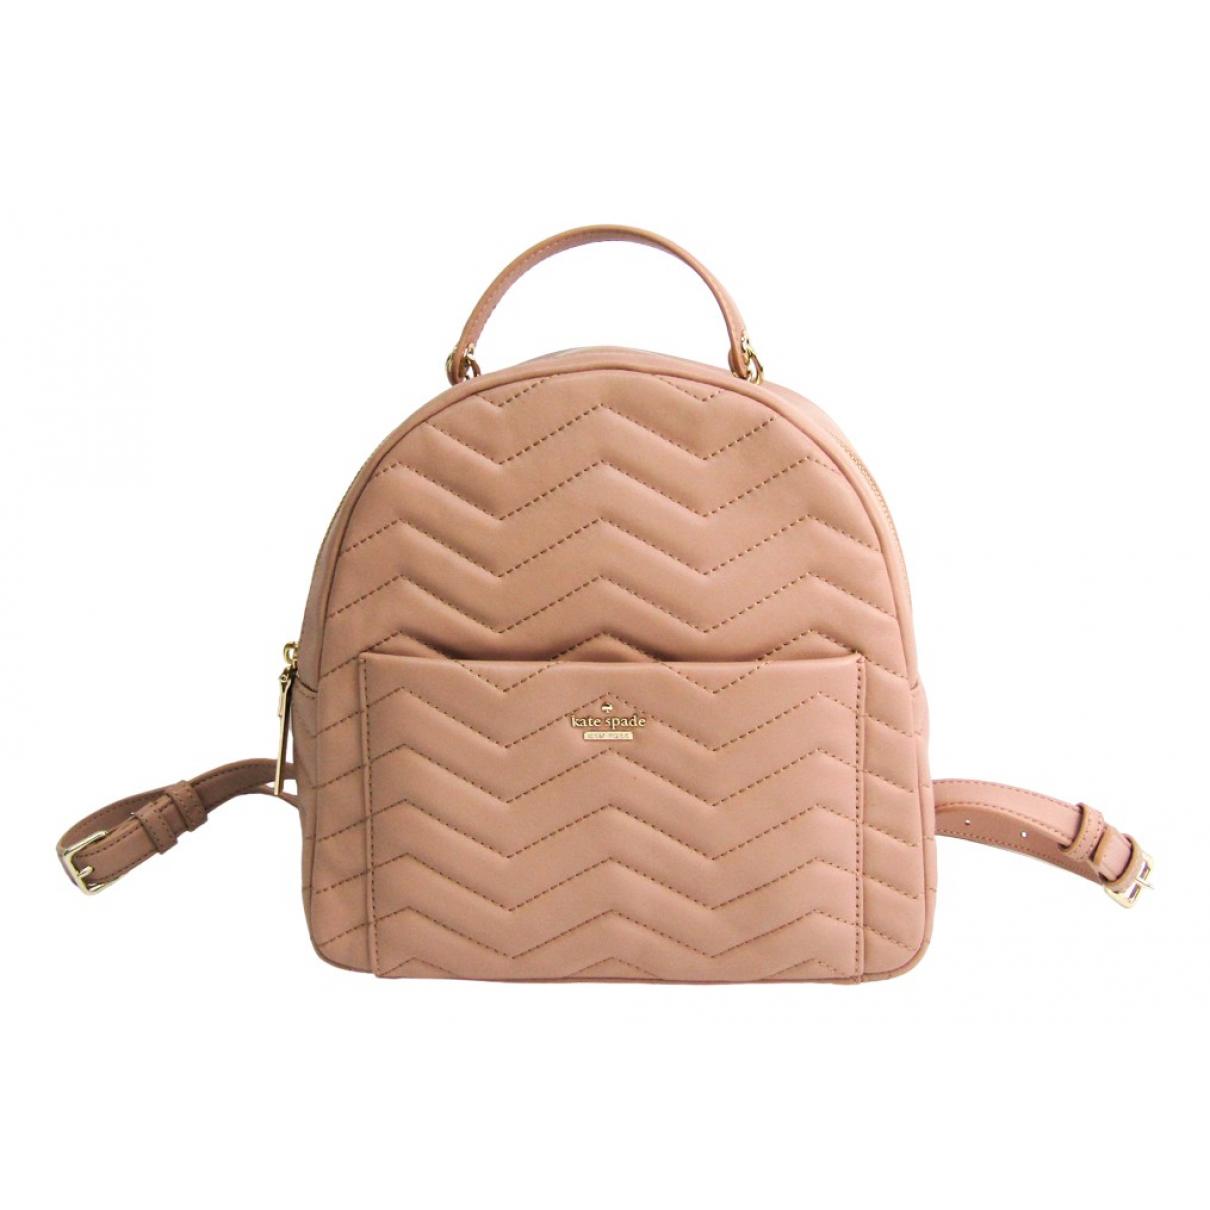 Kate Spade N Beige Leather backpack for Women N